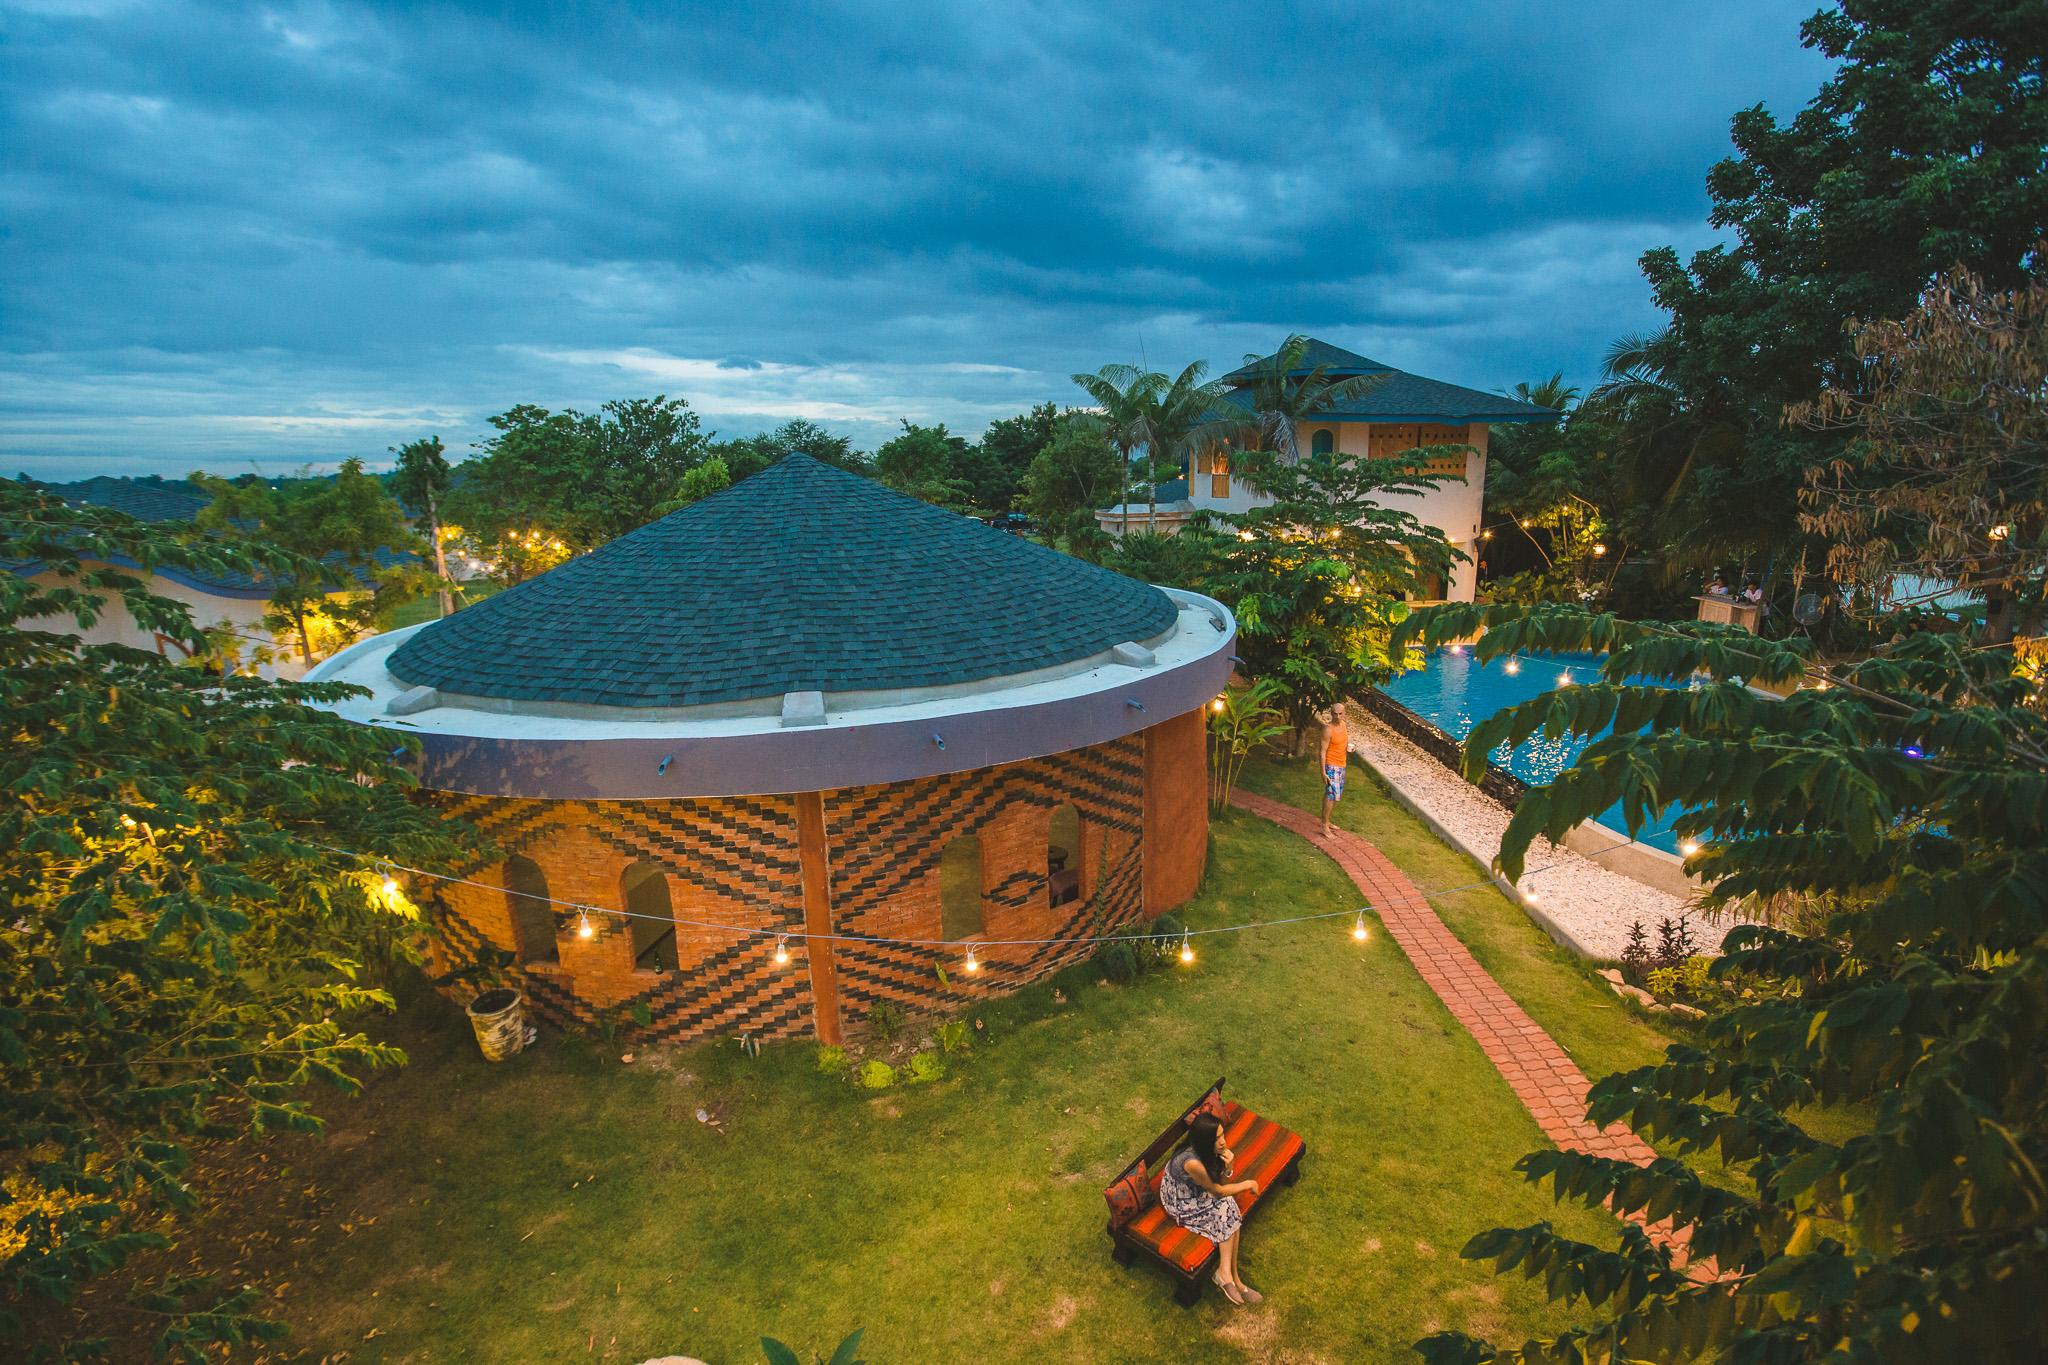 Yoga Shala by salt water pool @ Mala Dhara Eco Resort & Yoga Retreat Center in Chiang Mai, Thailand